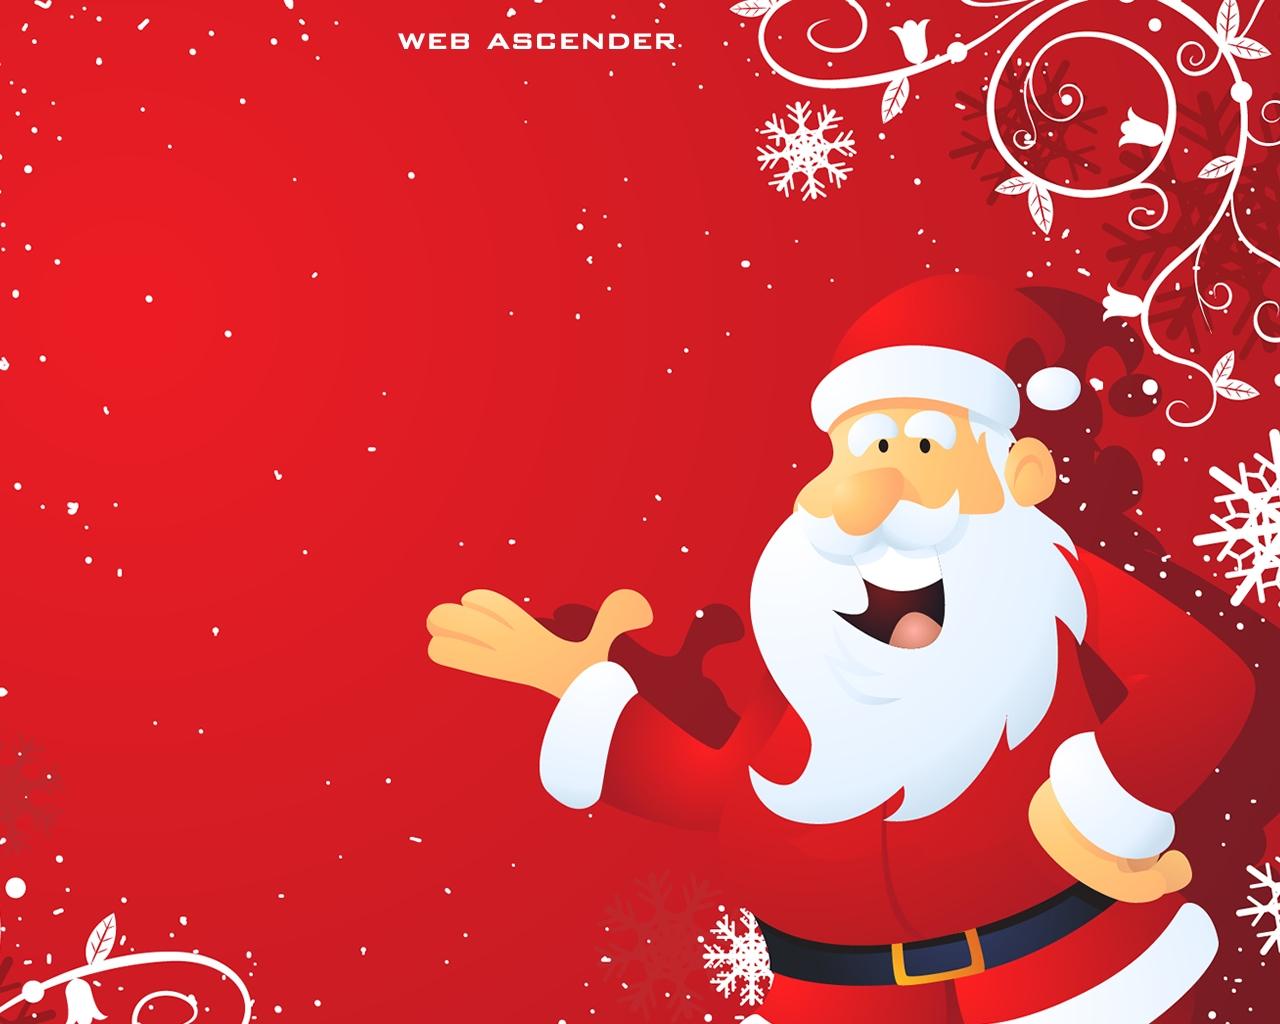 Santa Claus Fantasy Santa Claus